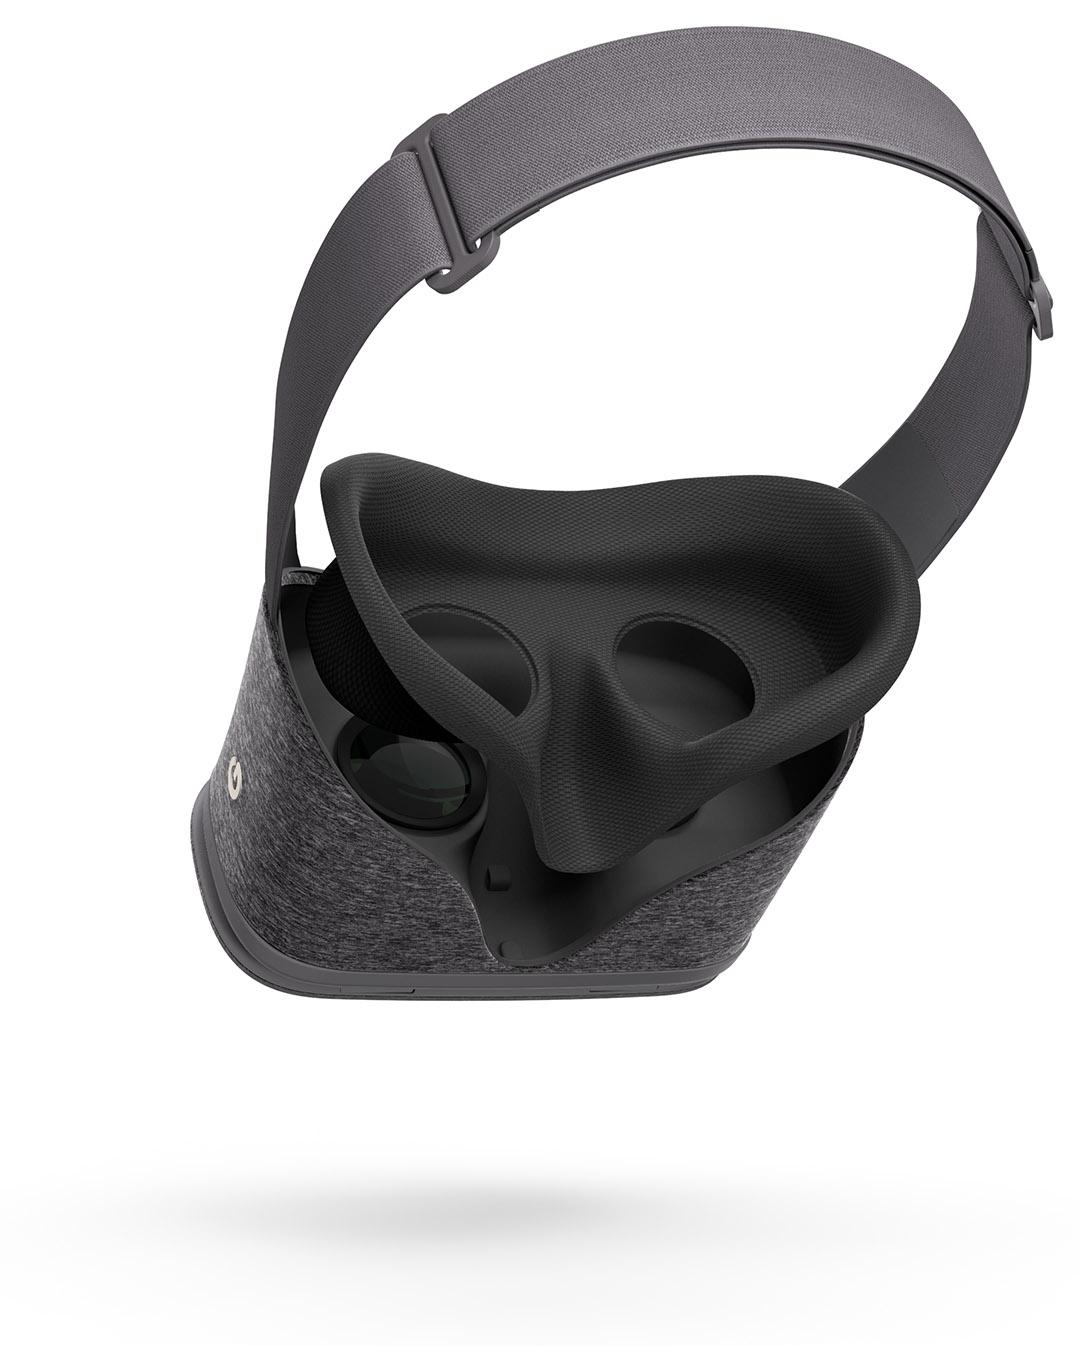 google-daydream-view-headset